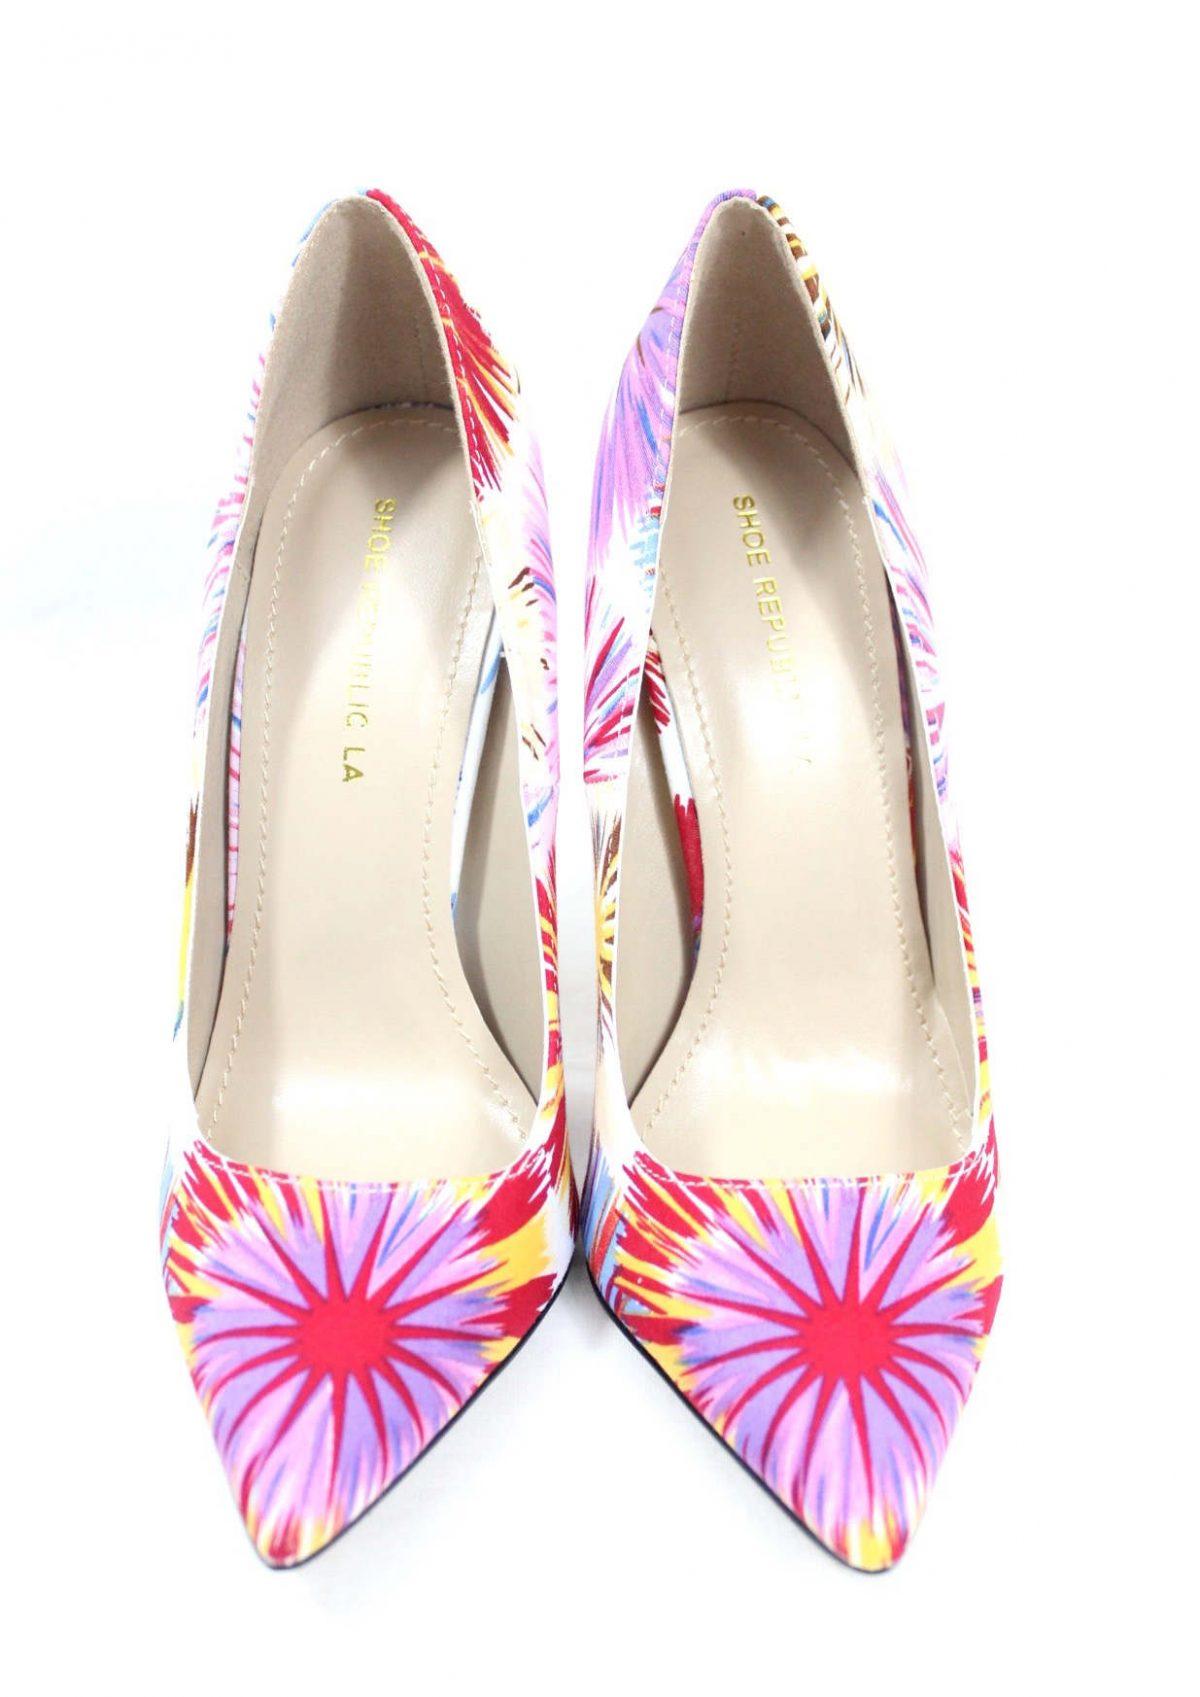 Shoe Republic Cajun White Pointy Toe Pumps-4557